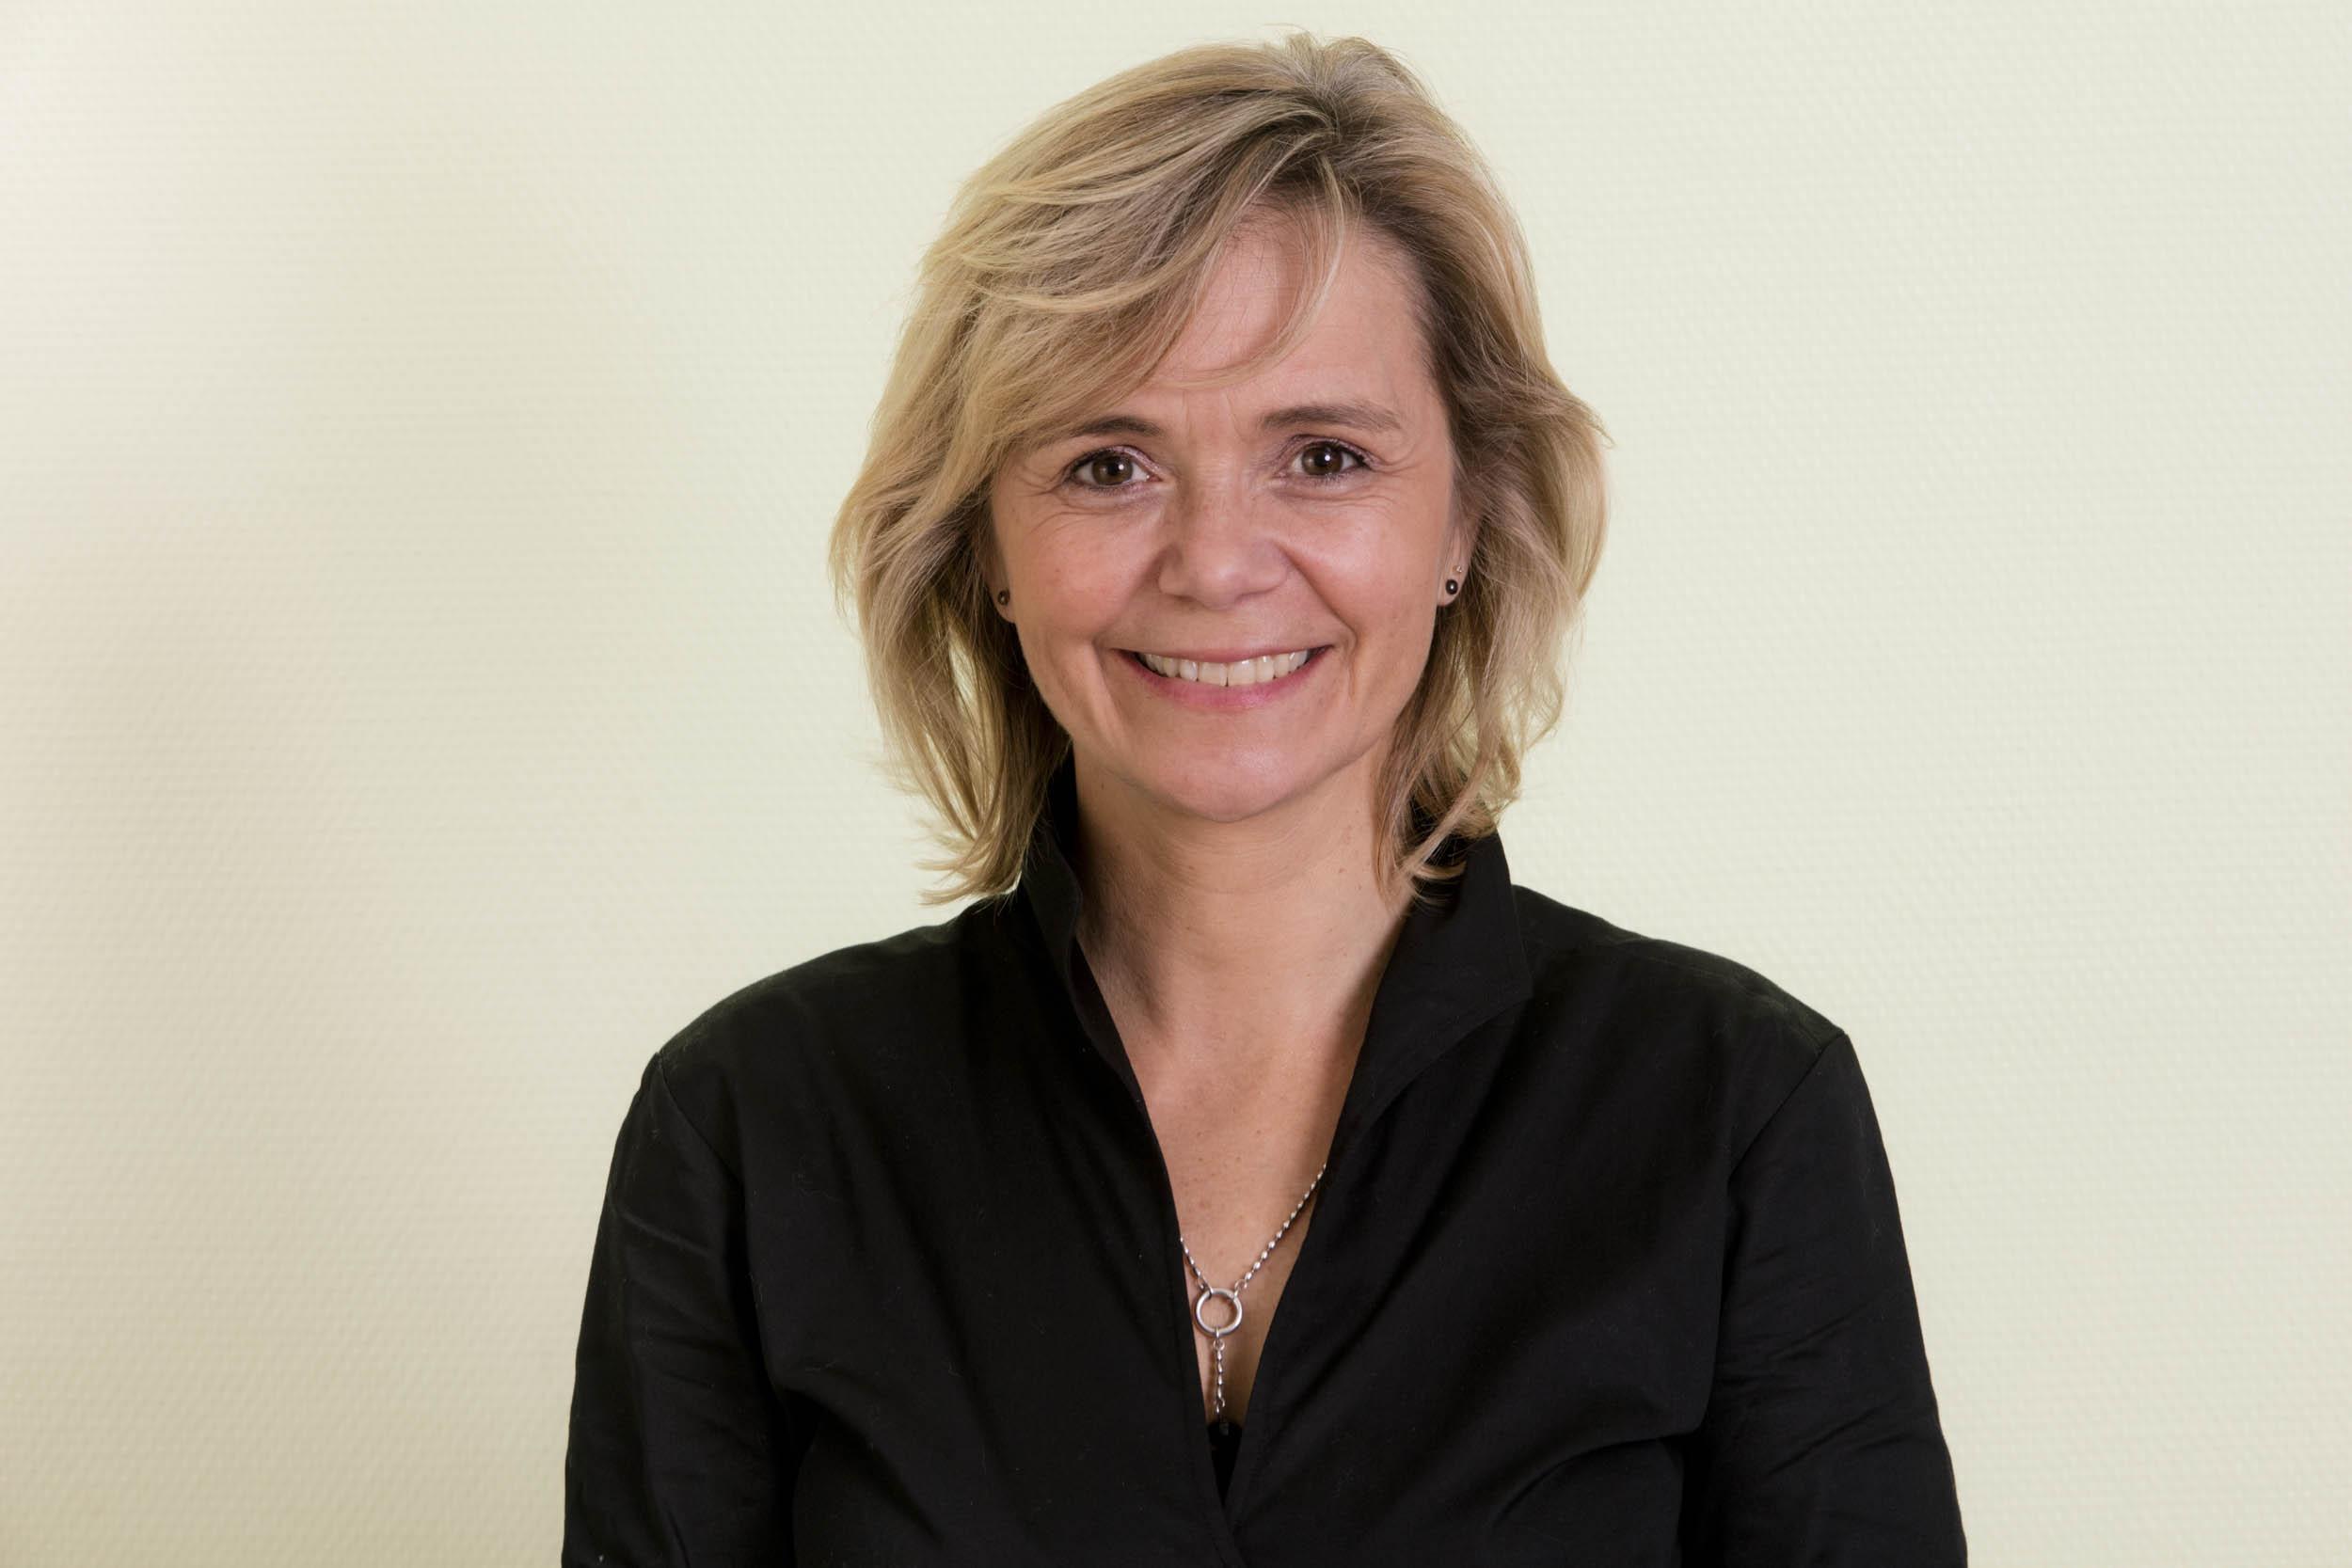 Katrin Petrucci – LOS Hamburg-Hoheluft